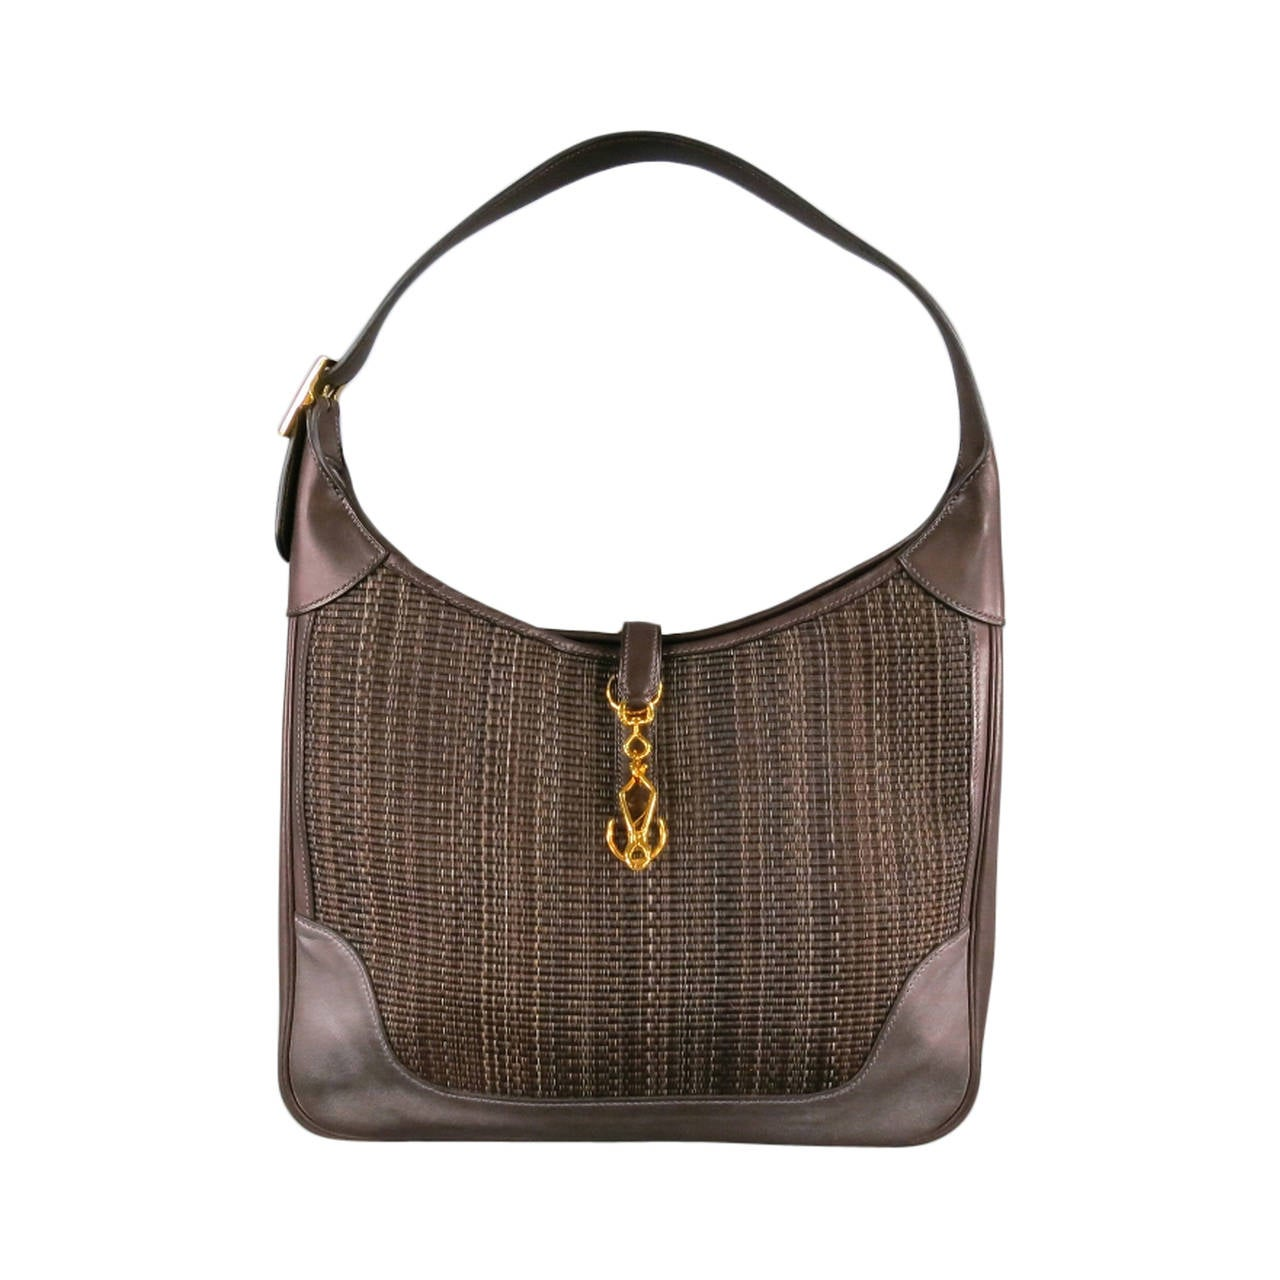 HERMES -Toile- Brown Leather Trim Woven Shoulder Bag at ...